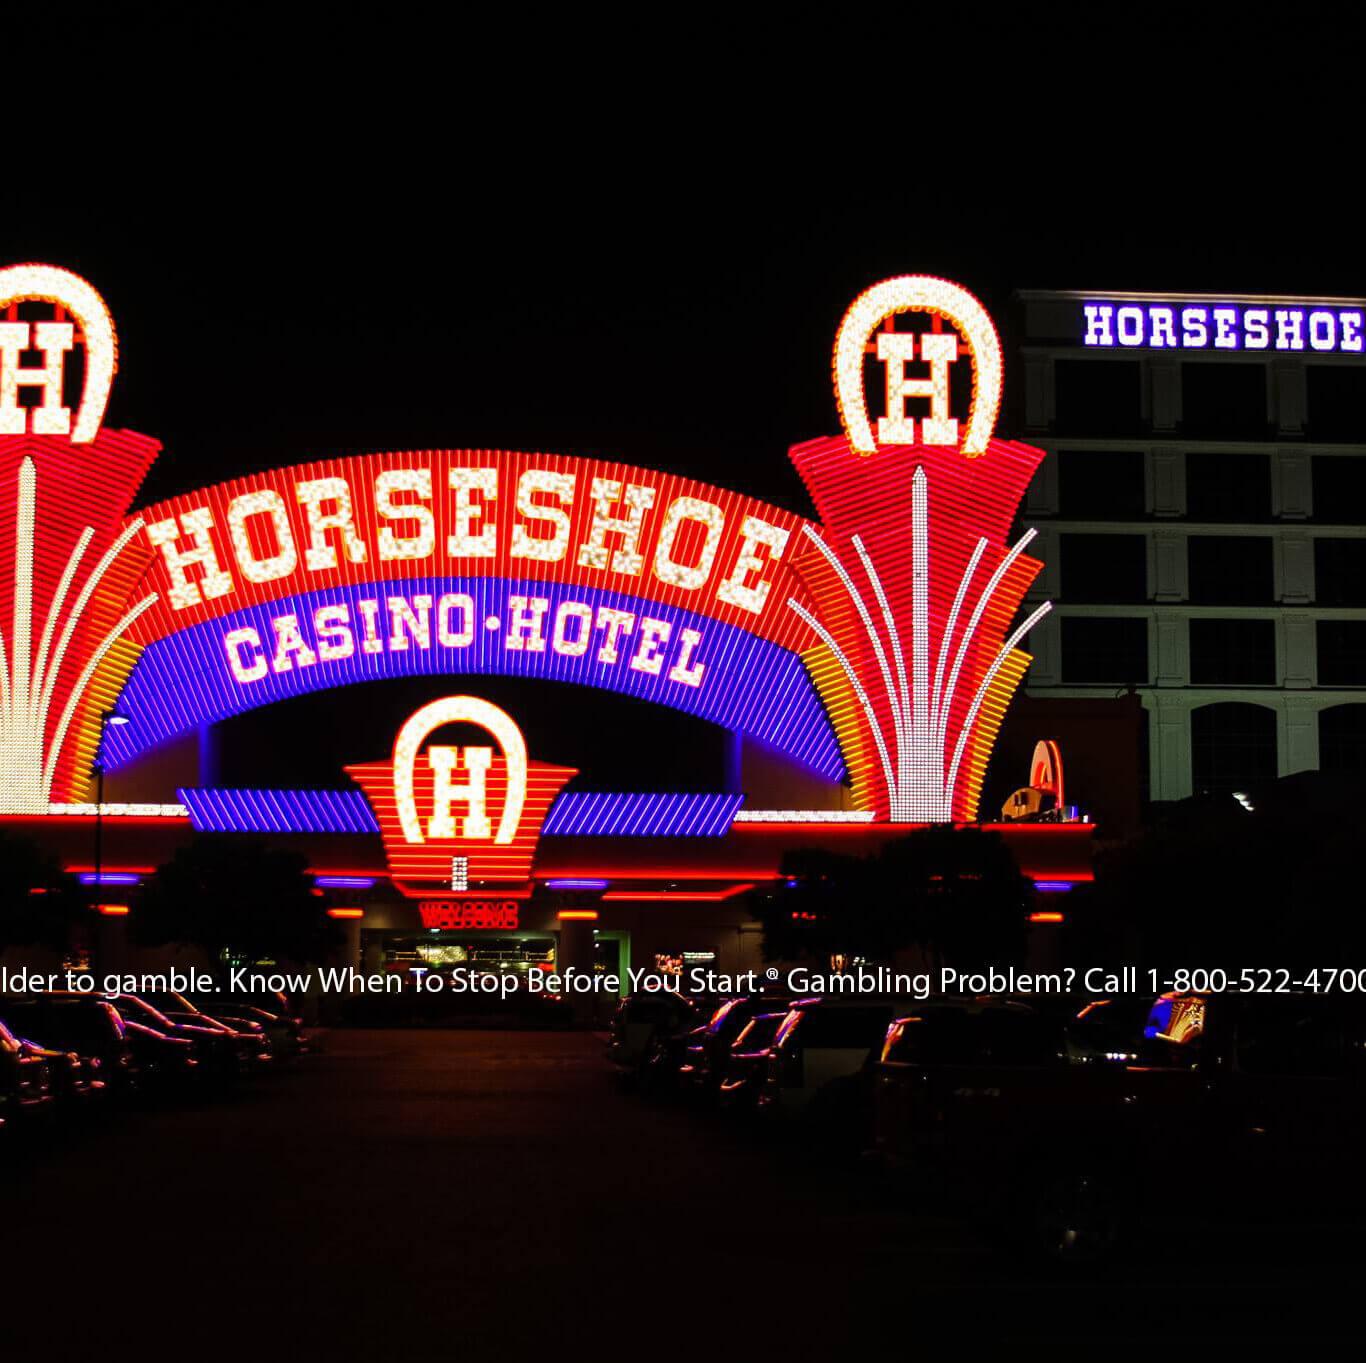 Horseshoe Tunica